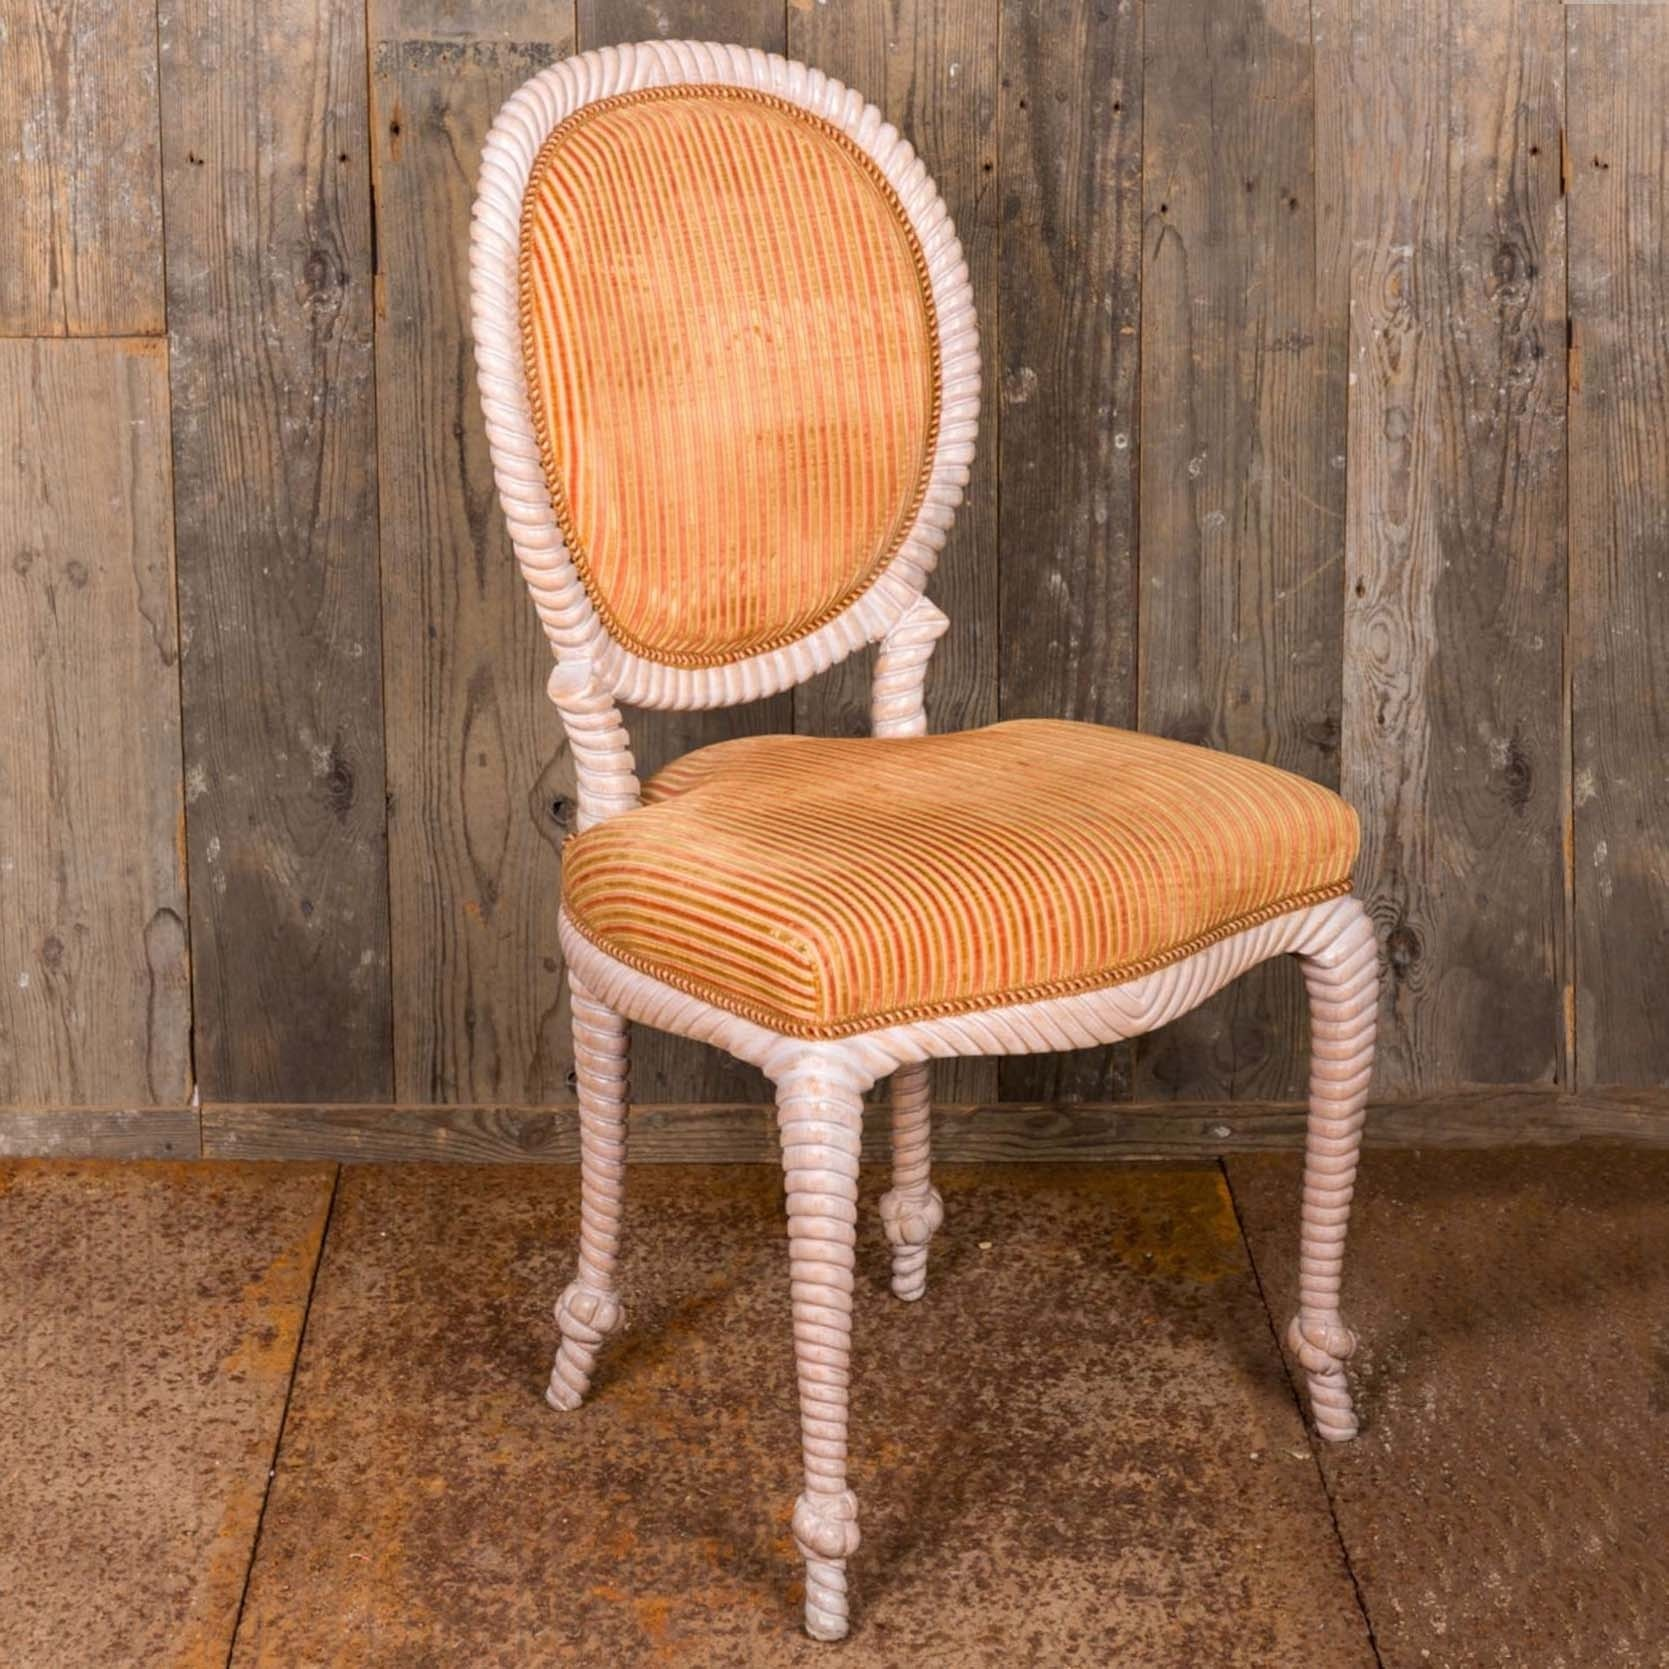 6 oude eetkamer stoelen